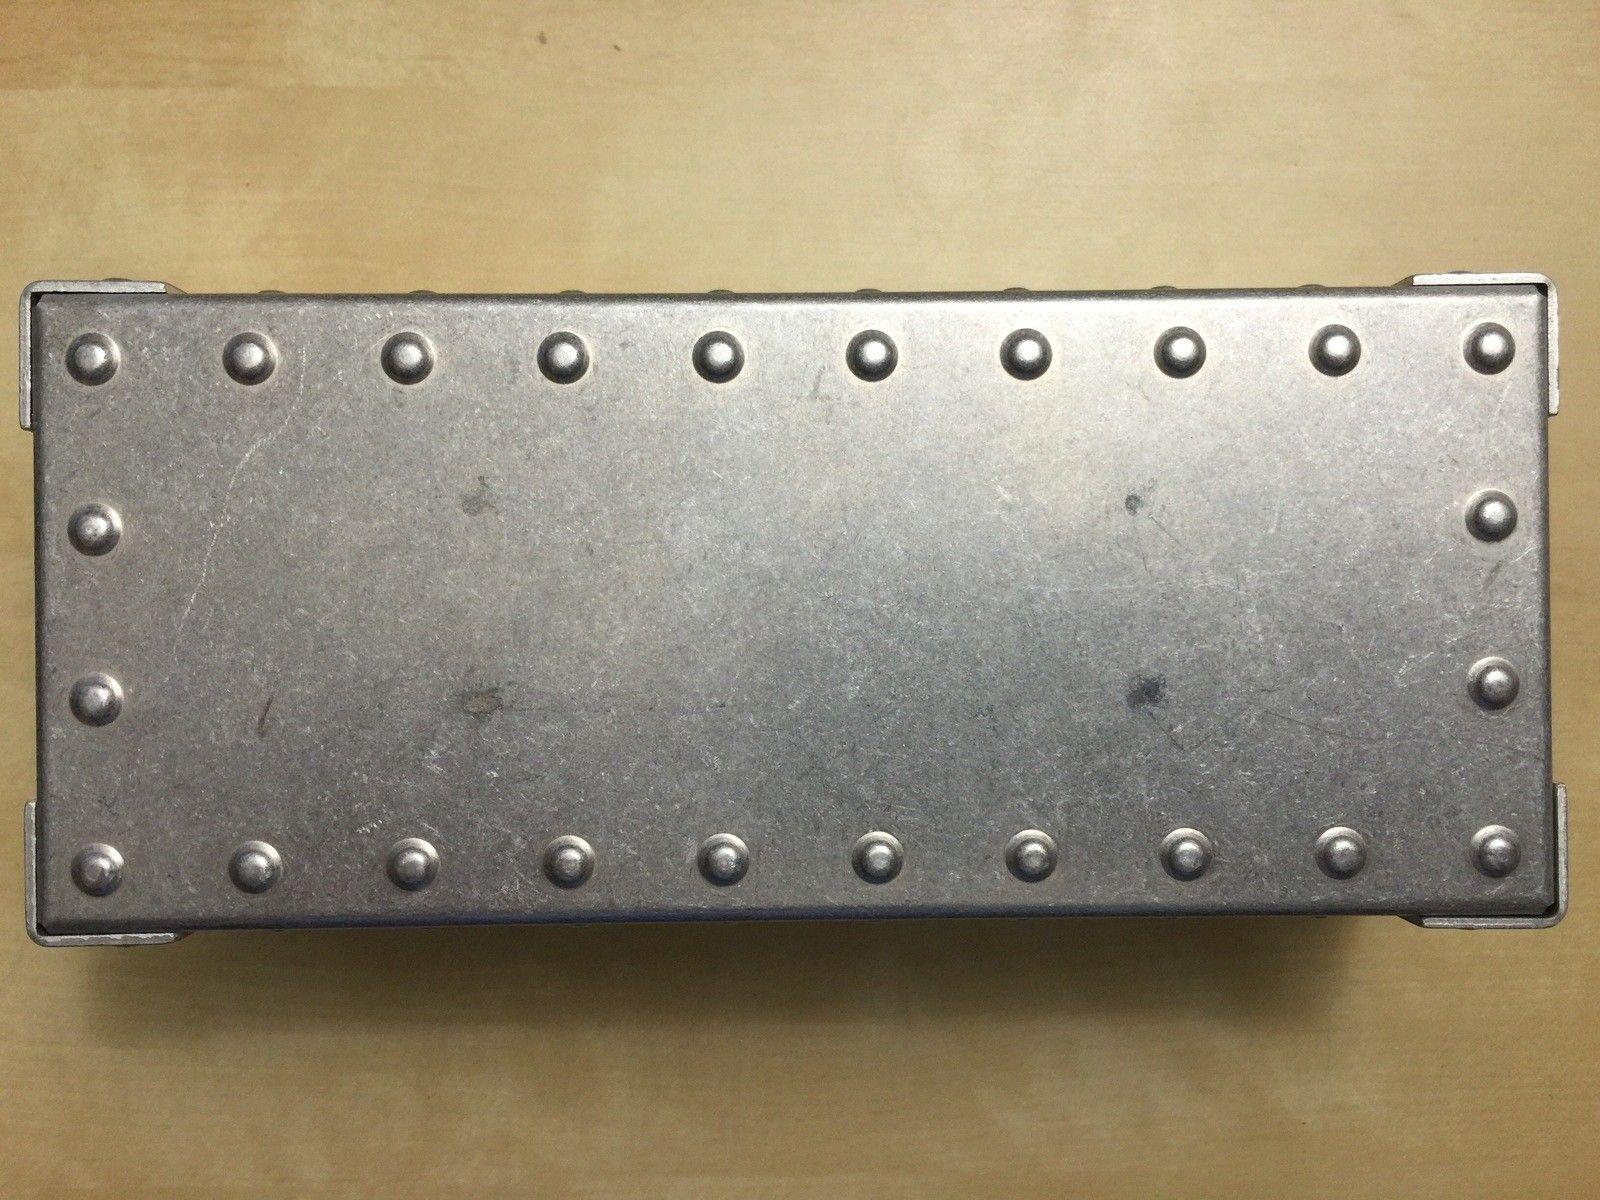 Large Metal Vault - FullSizeRender 10.jpg